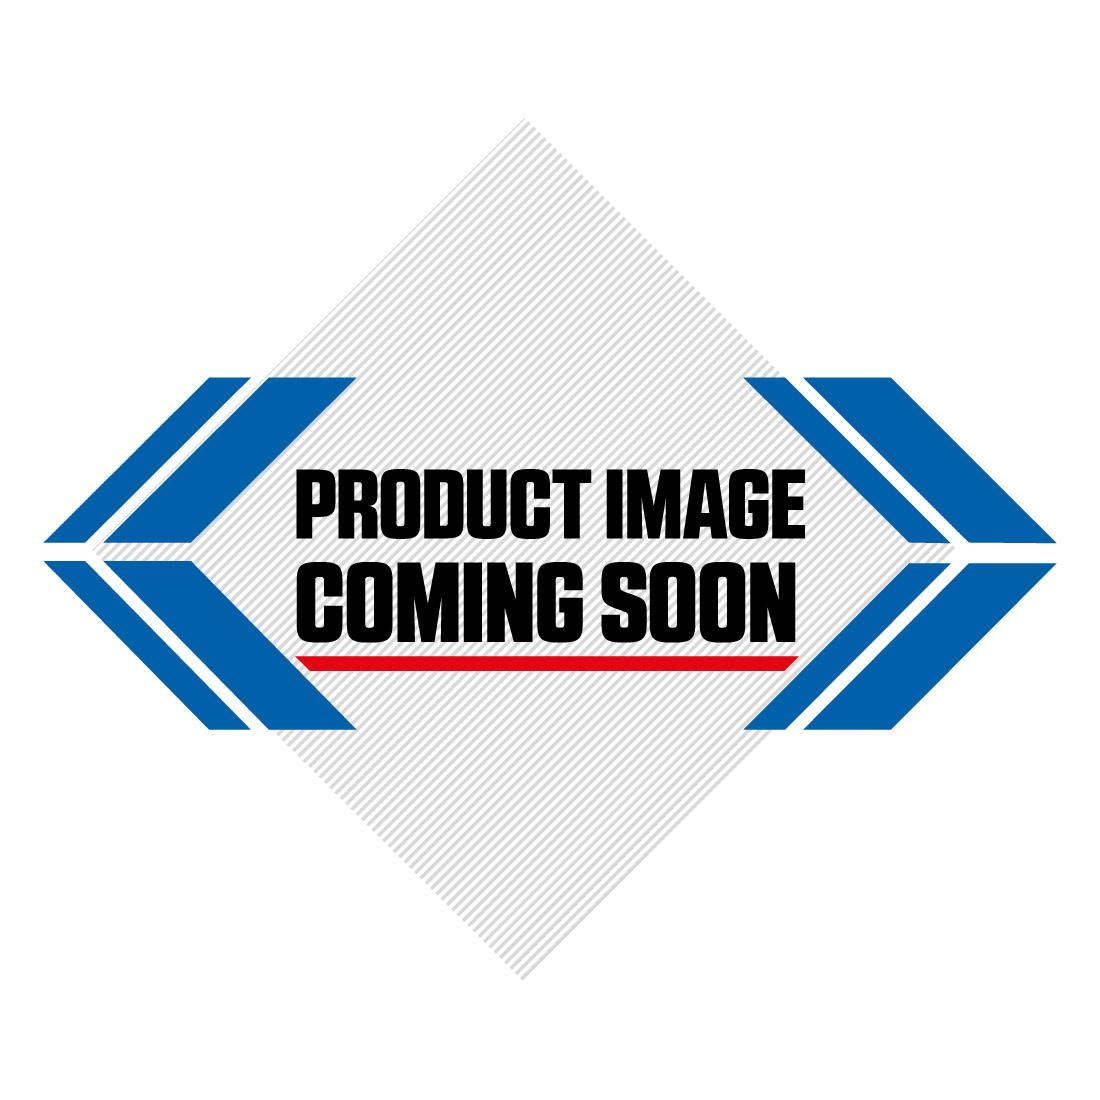 Renthal Twinring Rear Sprocket KTM SX SX-F EXC EXC-F Husqvarna TC FC TE FE - Black Image-5